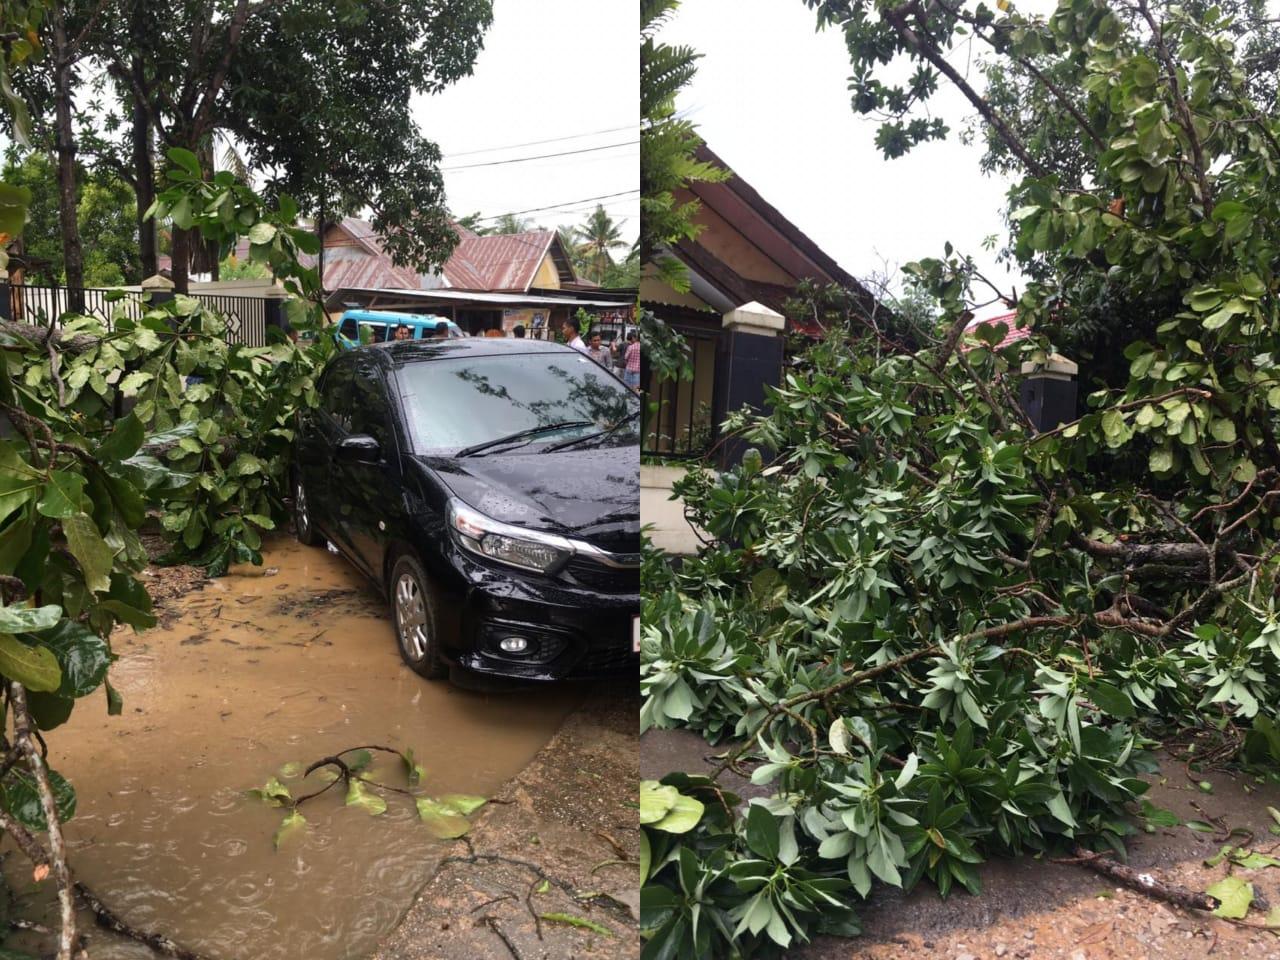 Pohon tumbang menimpa sebuah mobil di Depan SMA Muhammadiyah Kendari. (Foto : Istimewa)